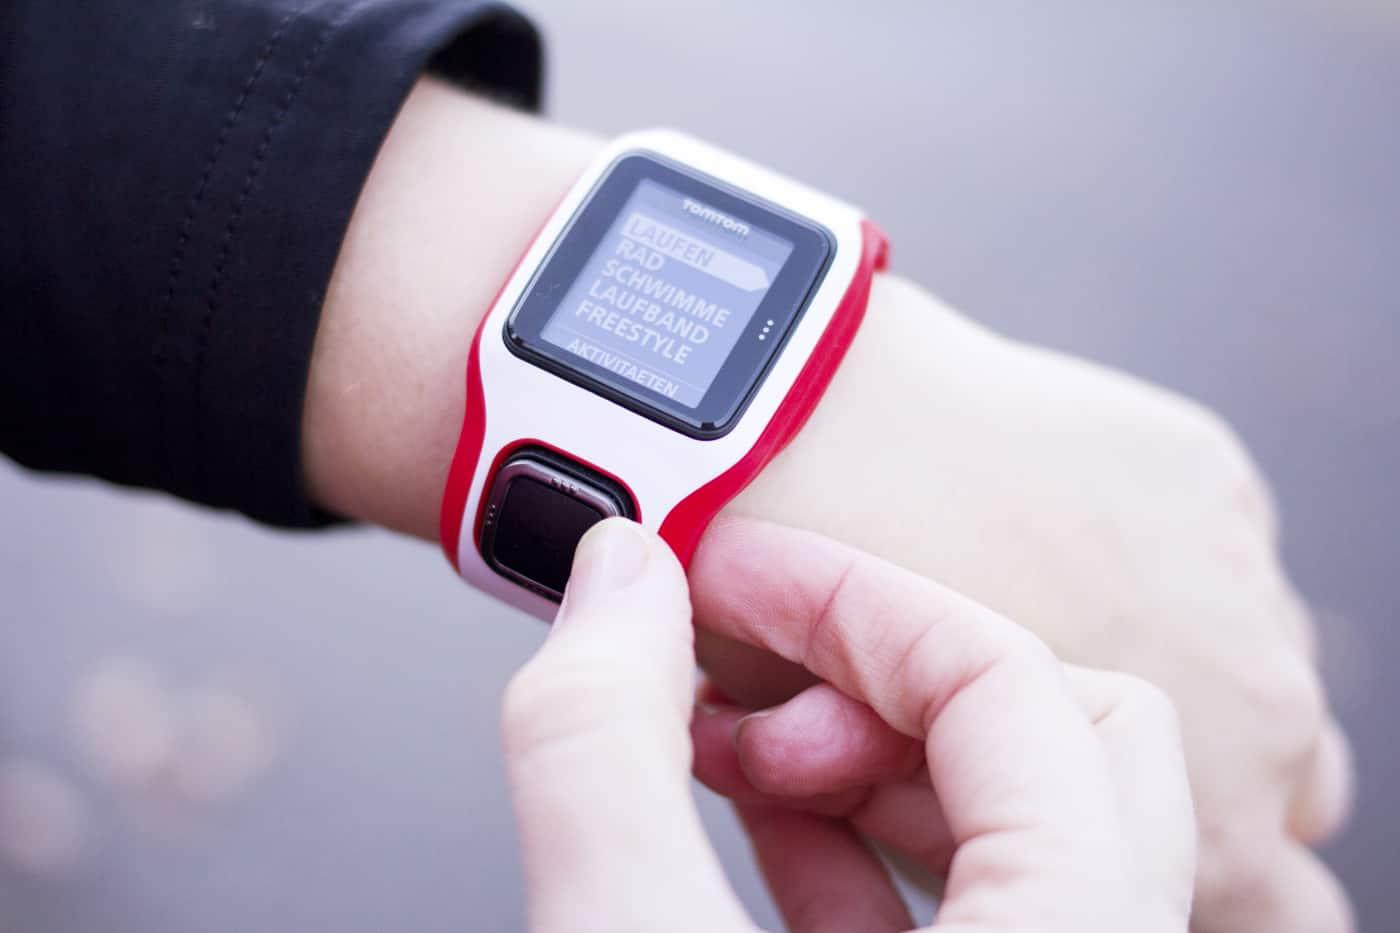 TomTom GPS Sportuhr Multisport Cardio Navigation